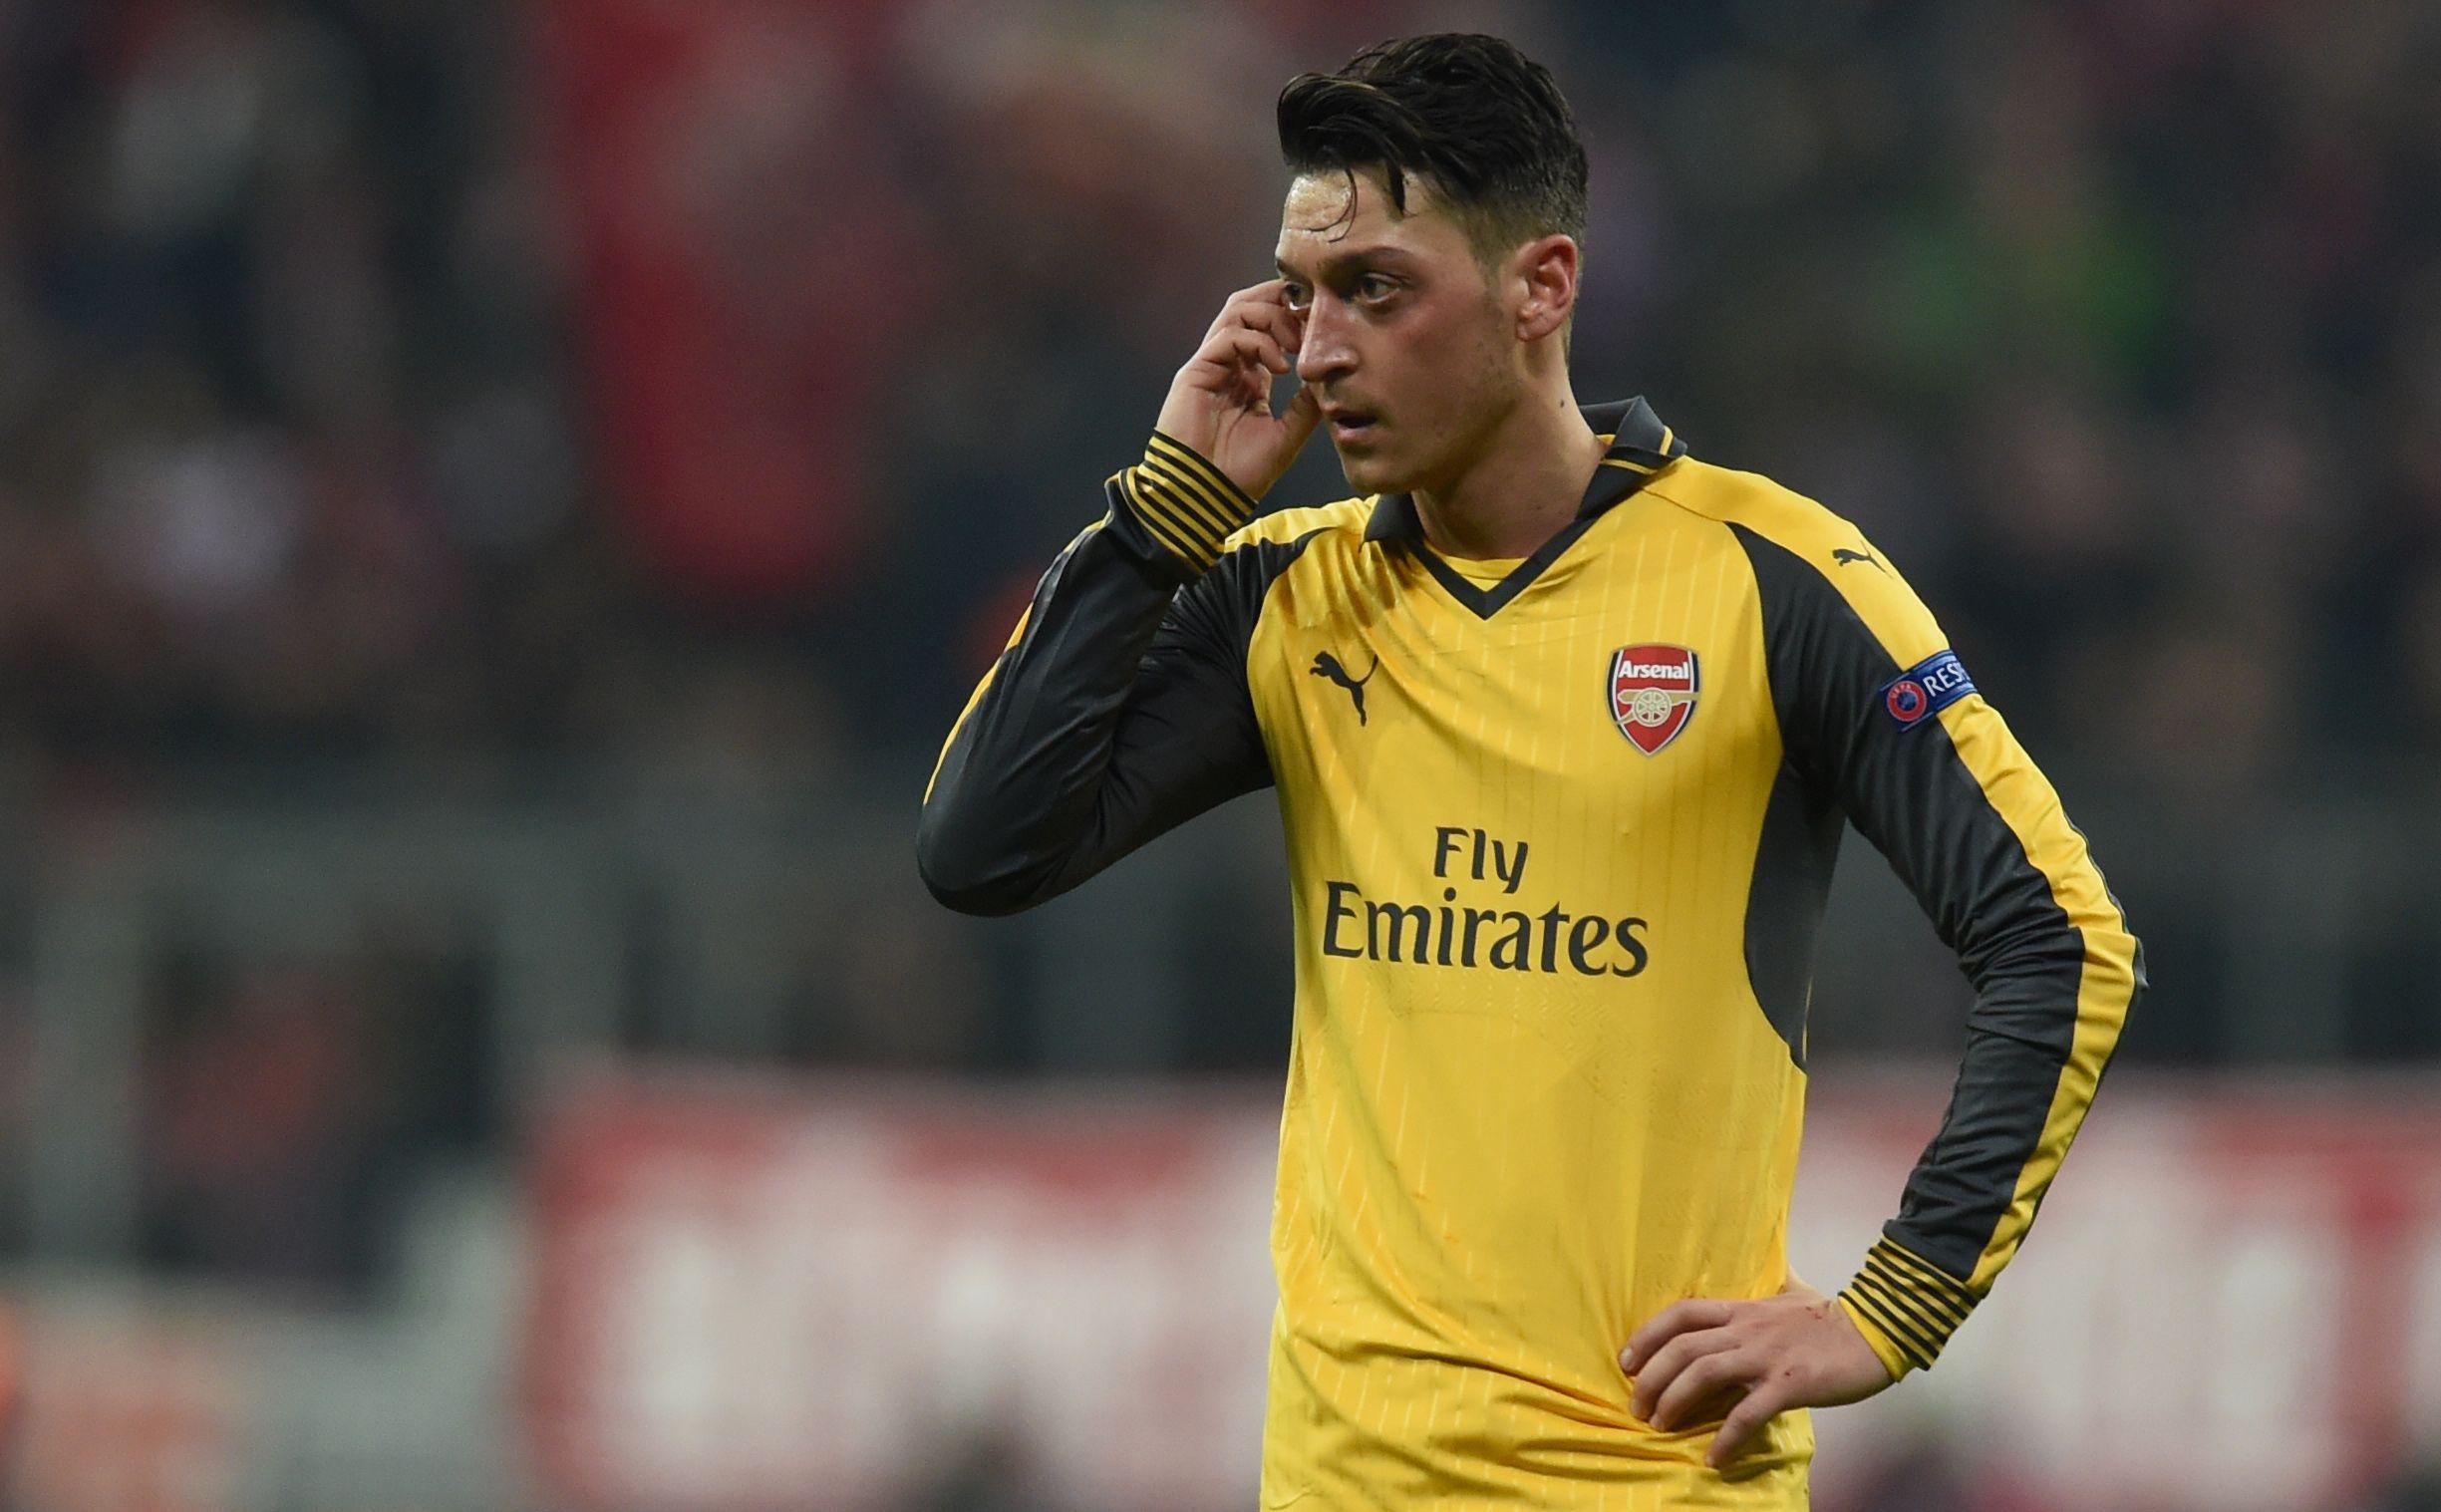 Arsenal: Mesut Ozil Reveals How he Signed for Arsène Wenger